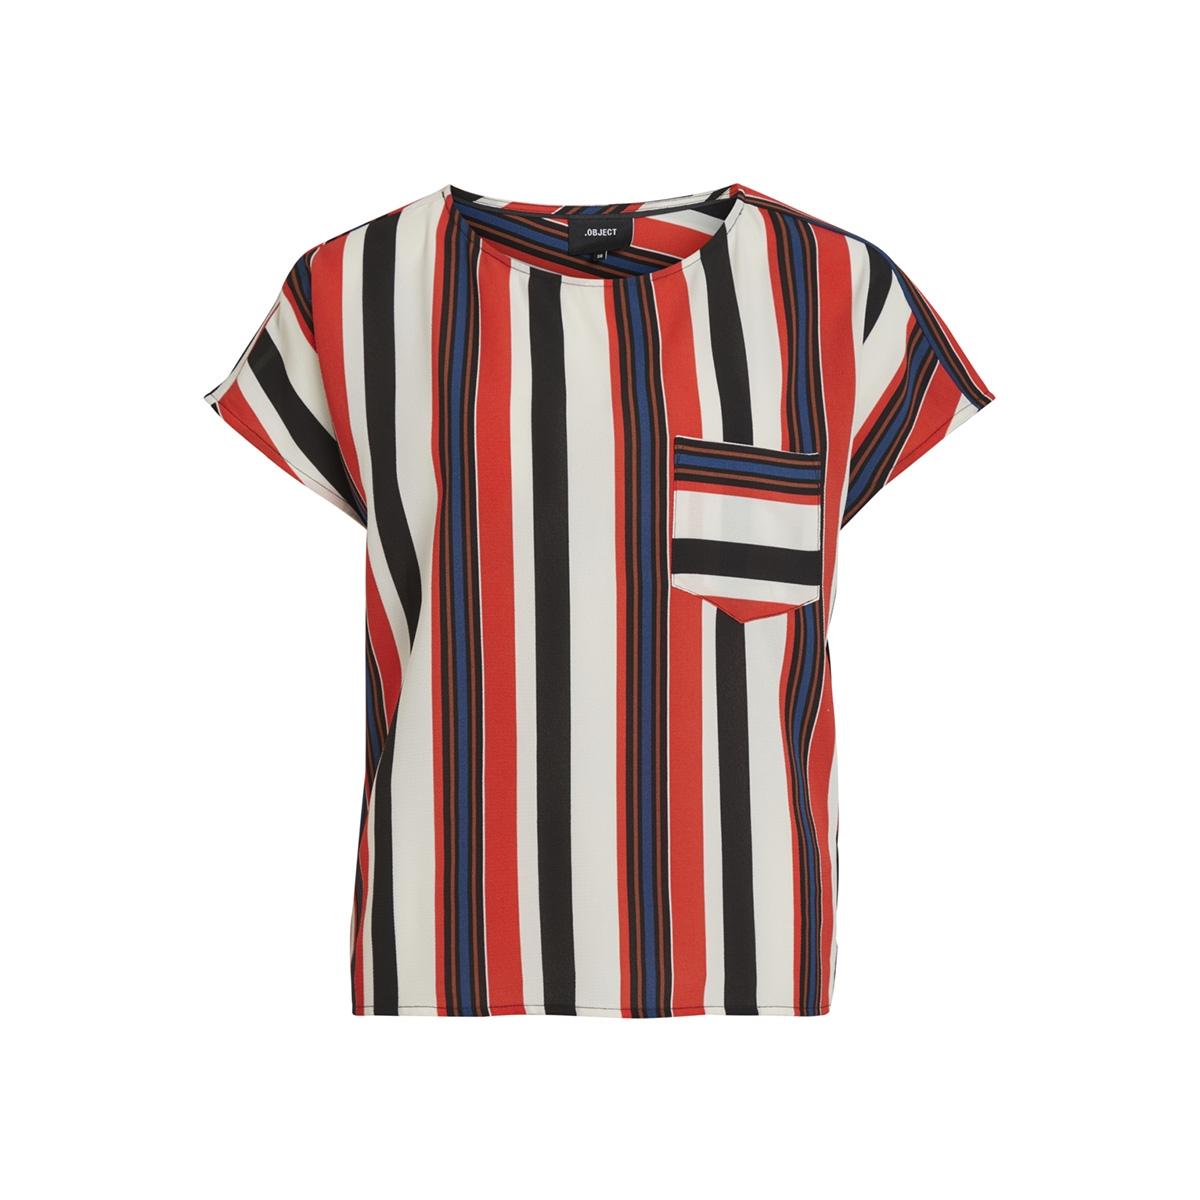 objtess karen s/s top rep 23027226 object t-shirt black/poppy red